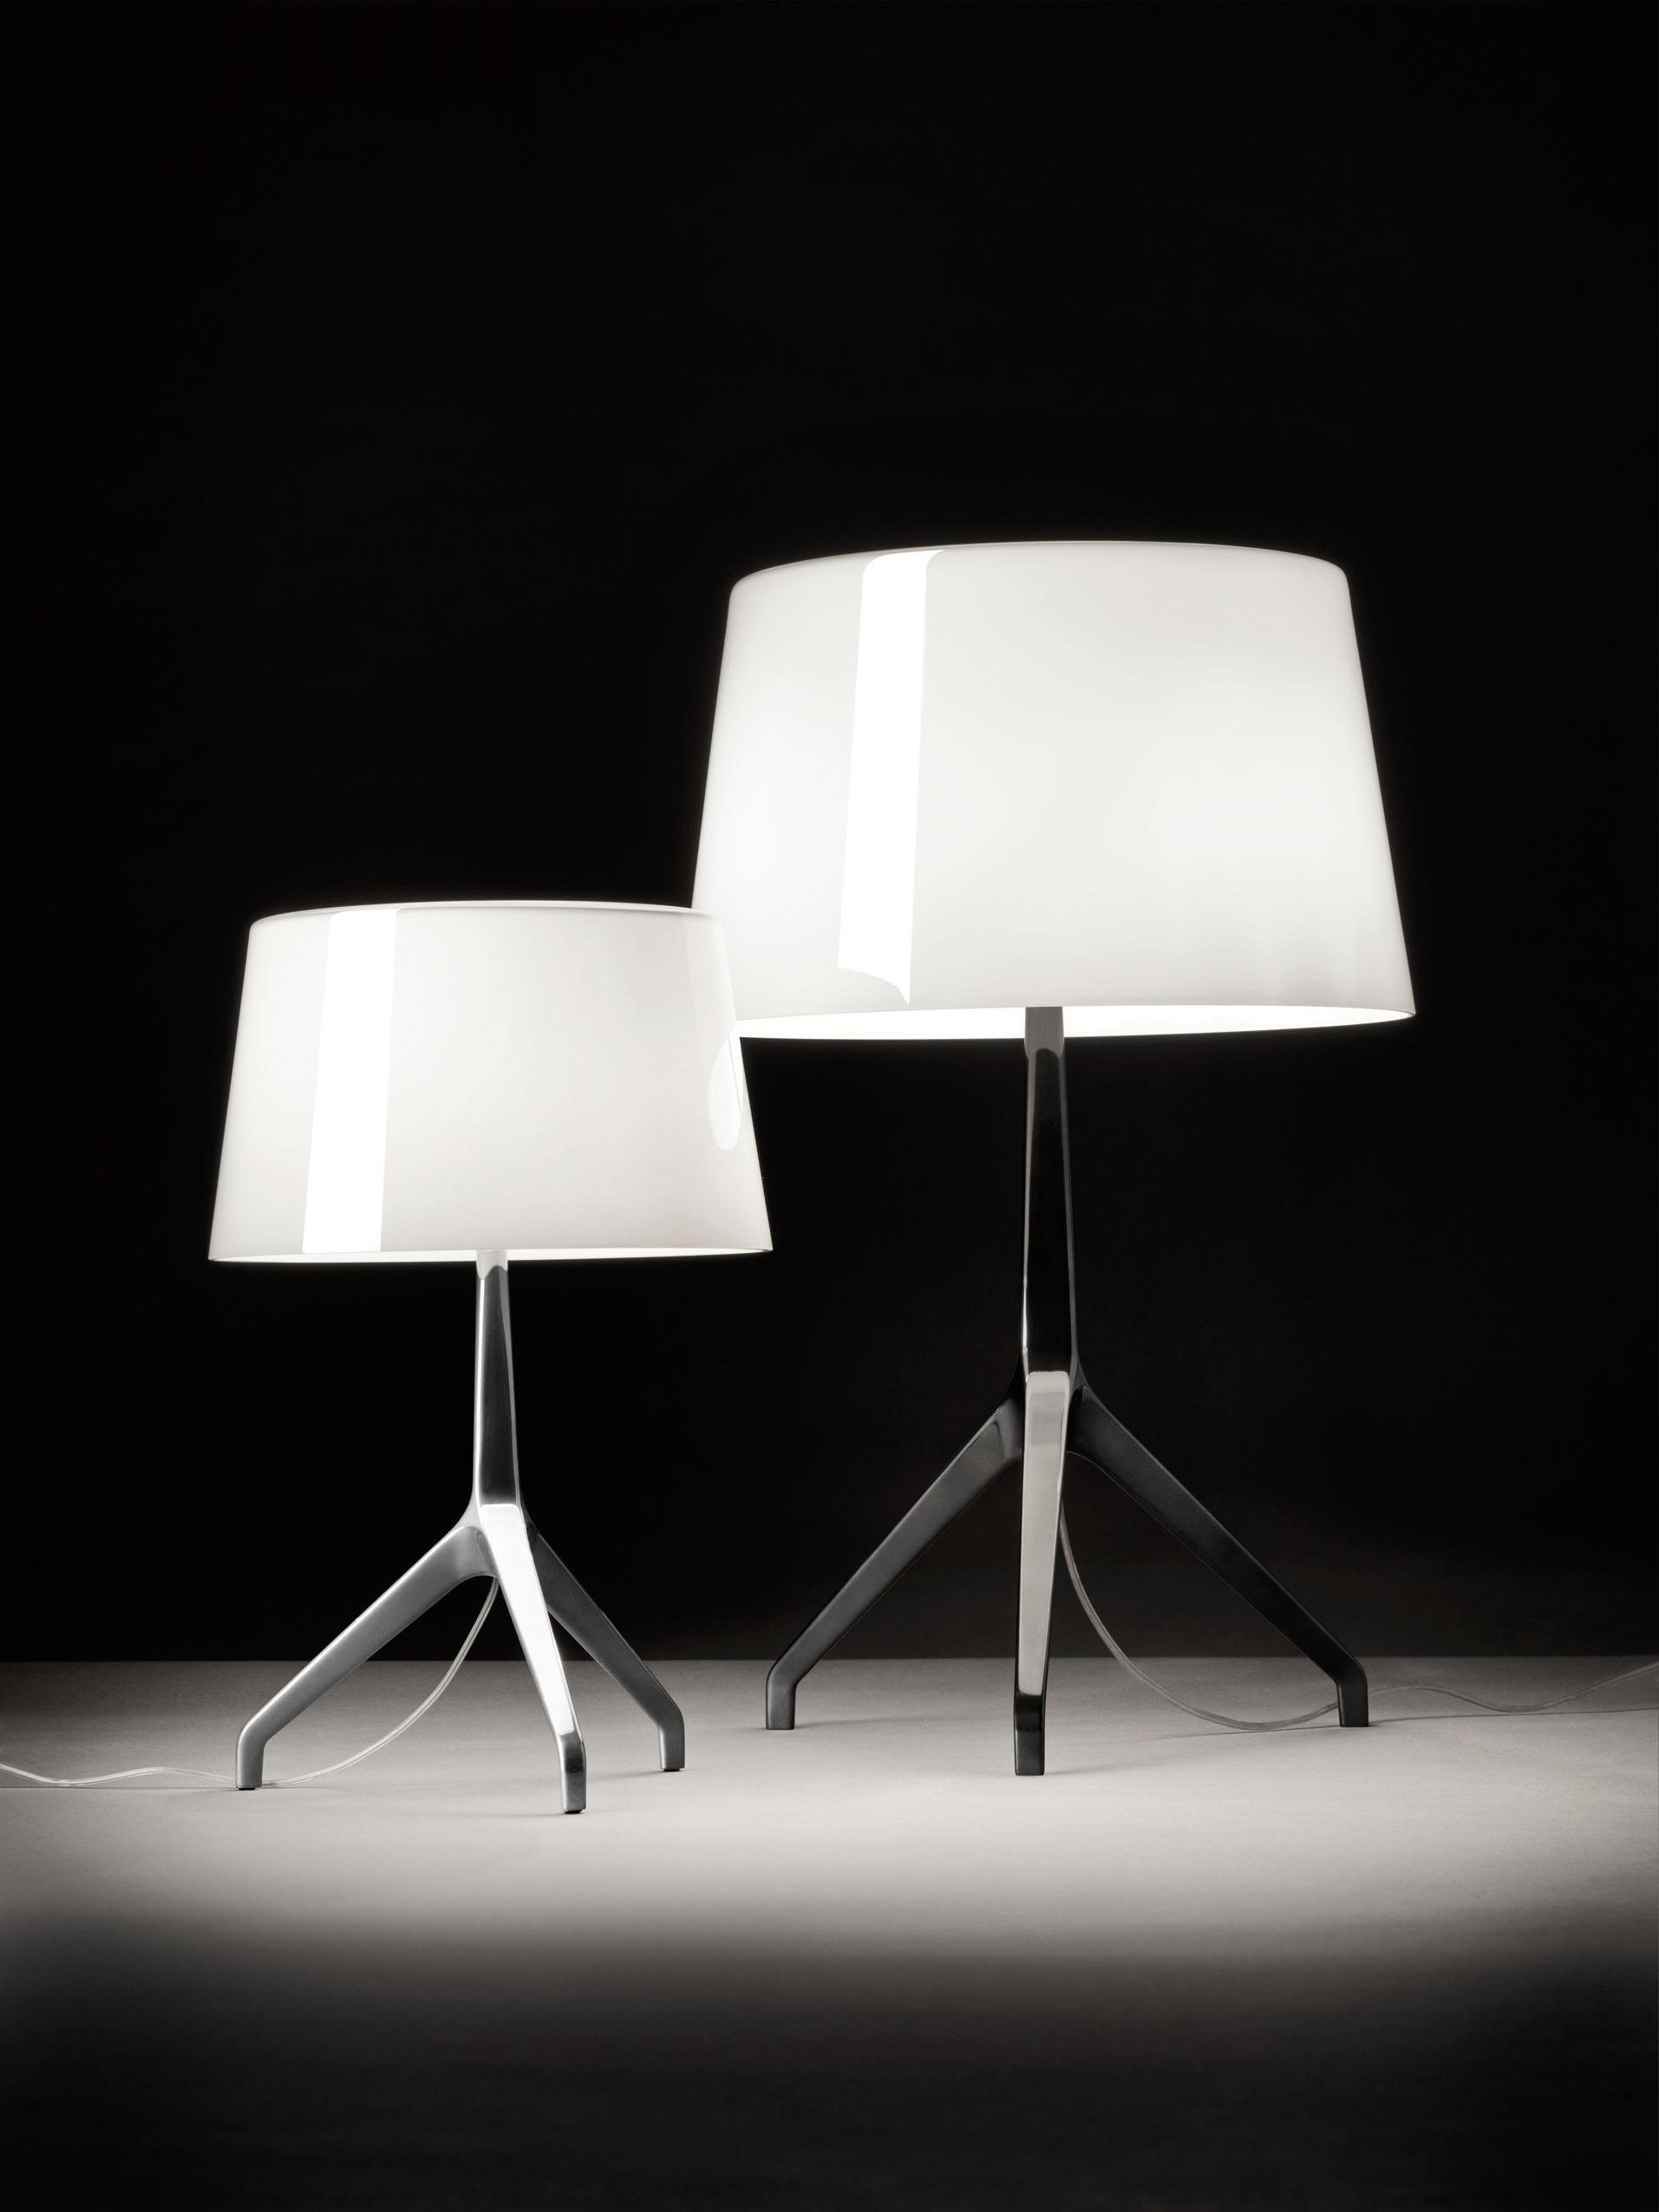 Lumiere Xxs Table Table Lights From Foscarini Architonic